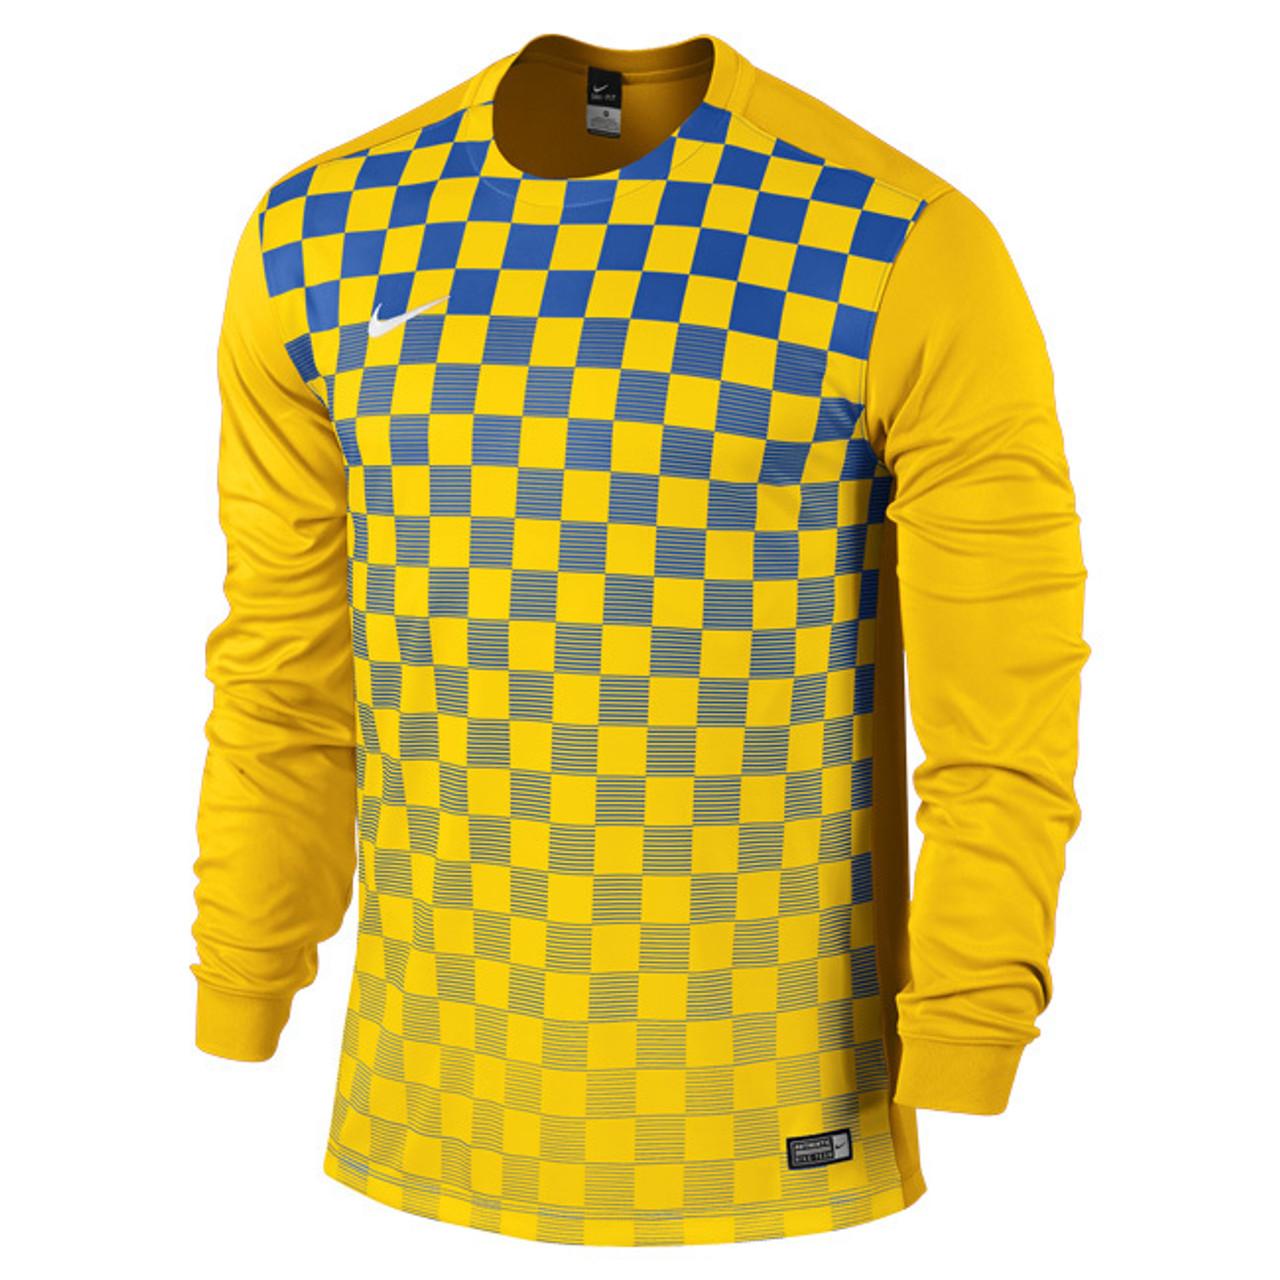 ef6678a04 Nike Precision III Jersey - ADULT Long Sleeve Uni Gold/Royal Blue/White ...